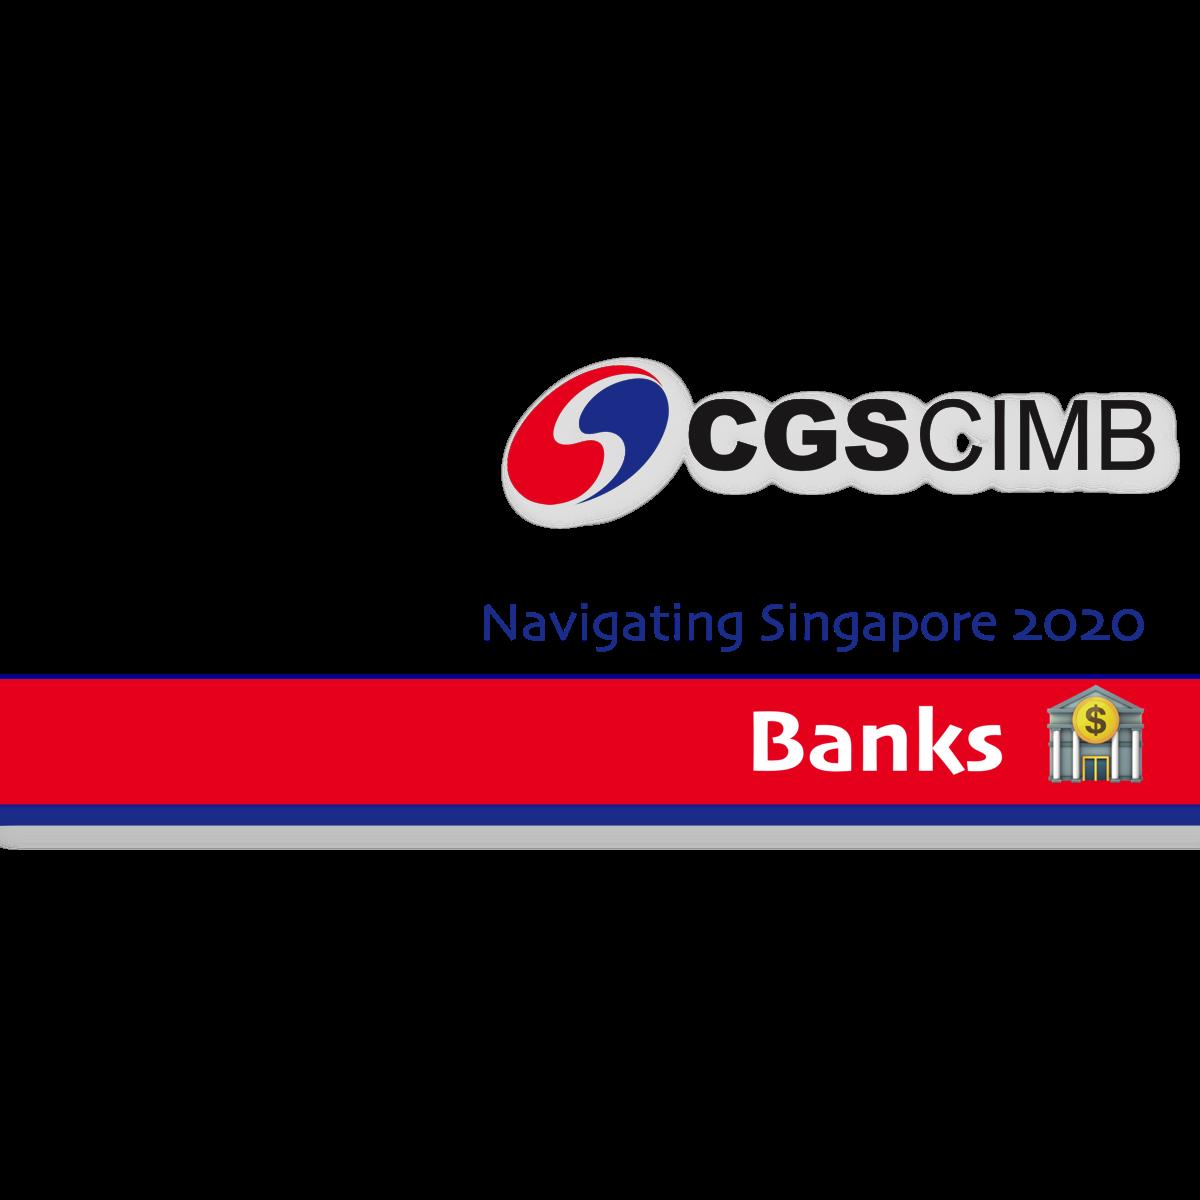 Singapore Banks 2020 Outlook - CGS-CIMB Research | SGinvestors.io